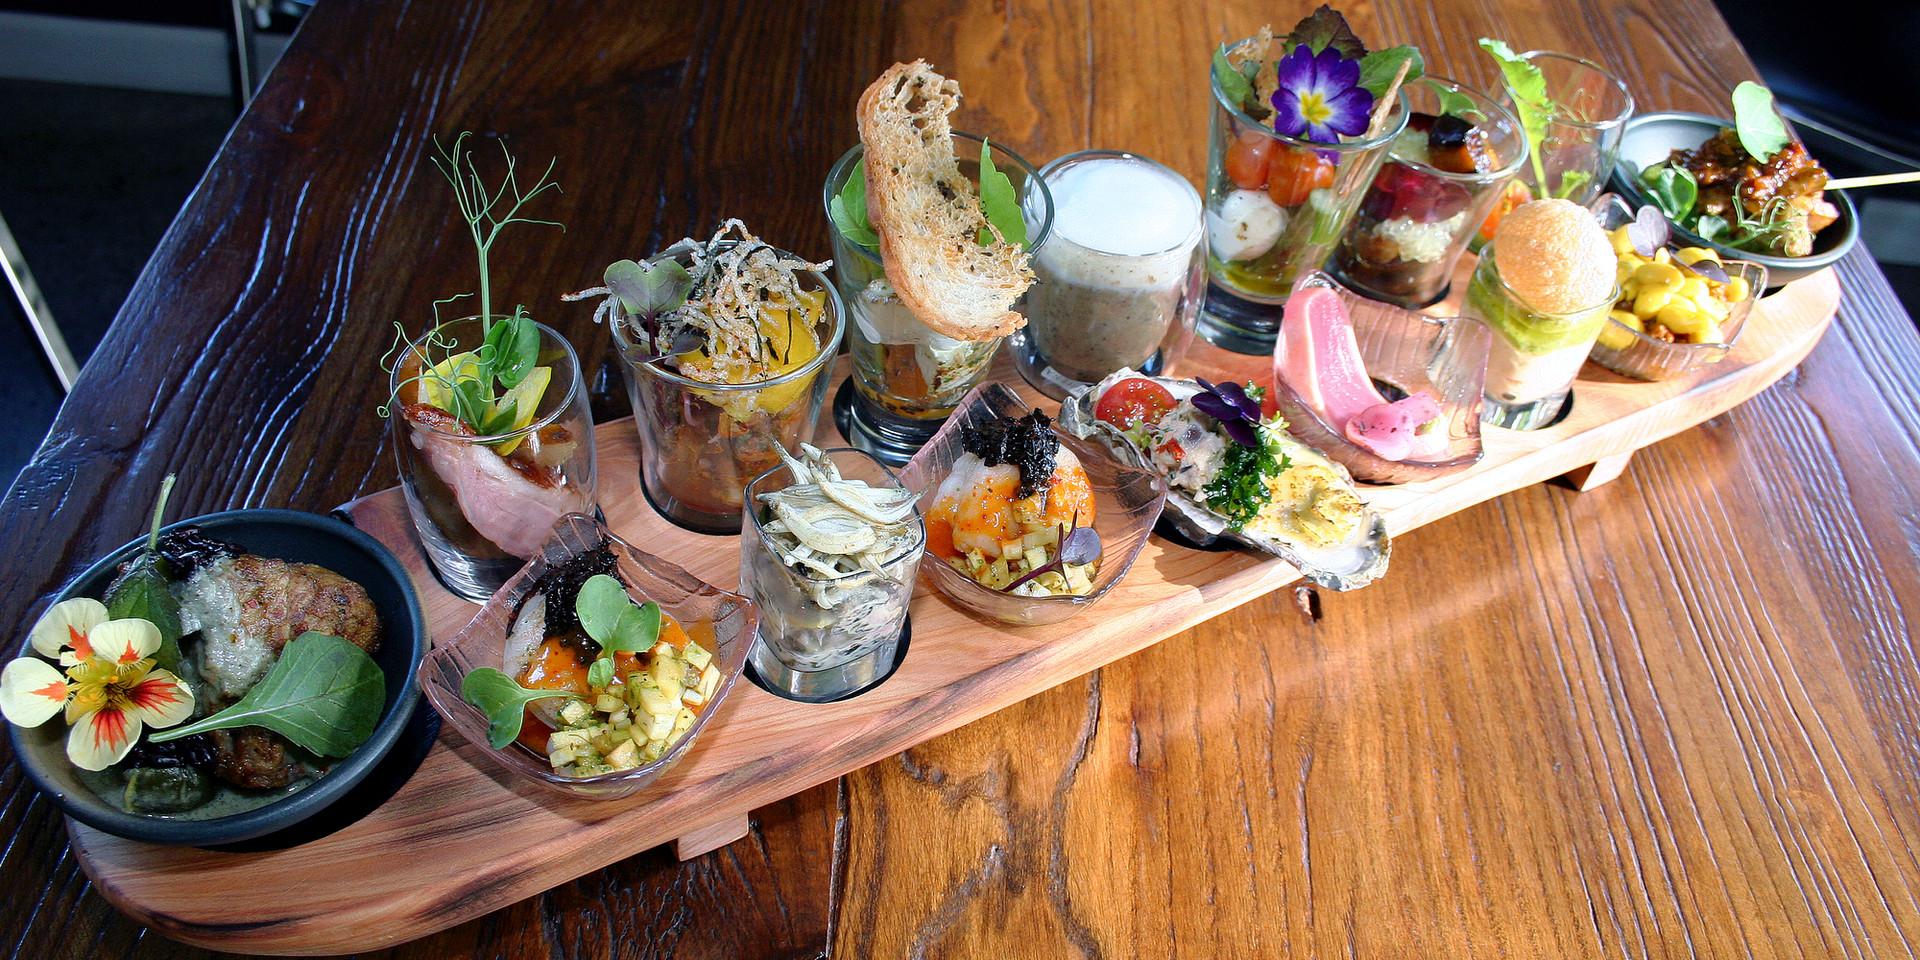 Sungka Entree Platter